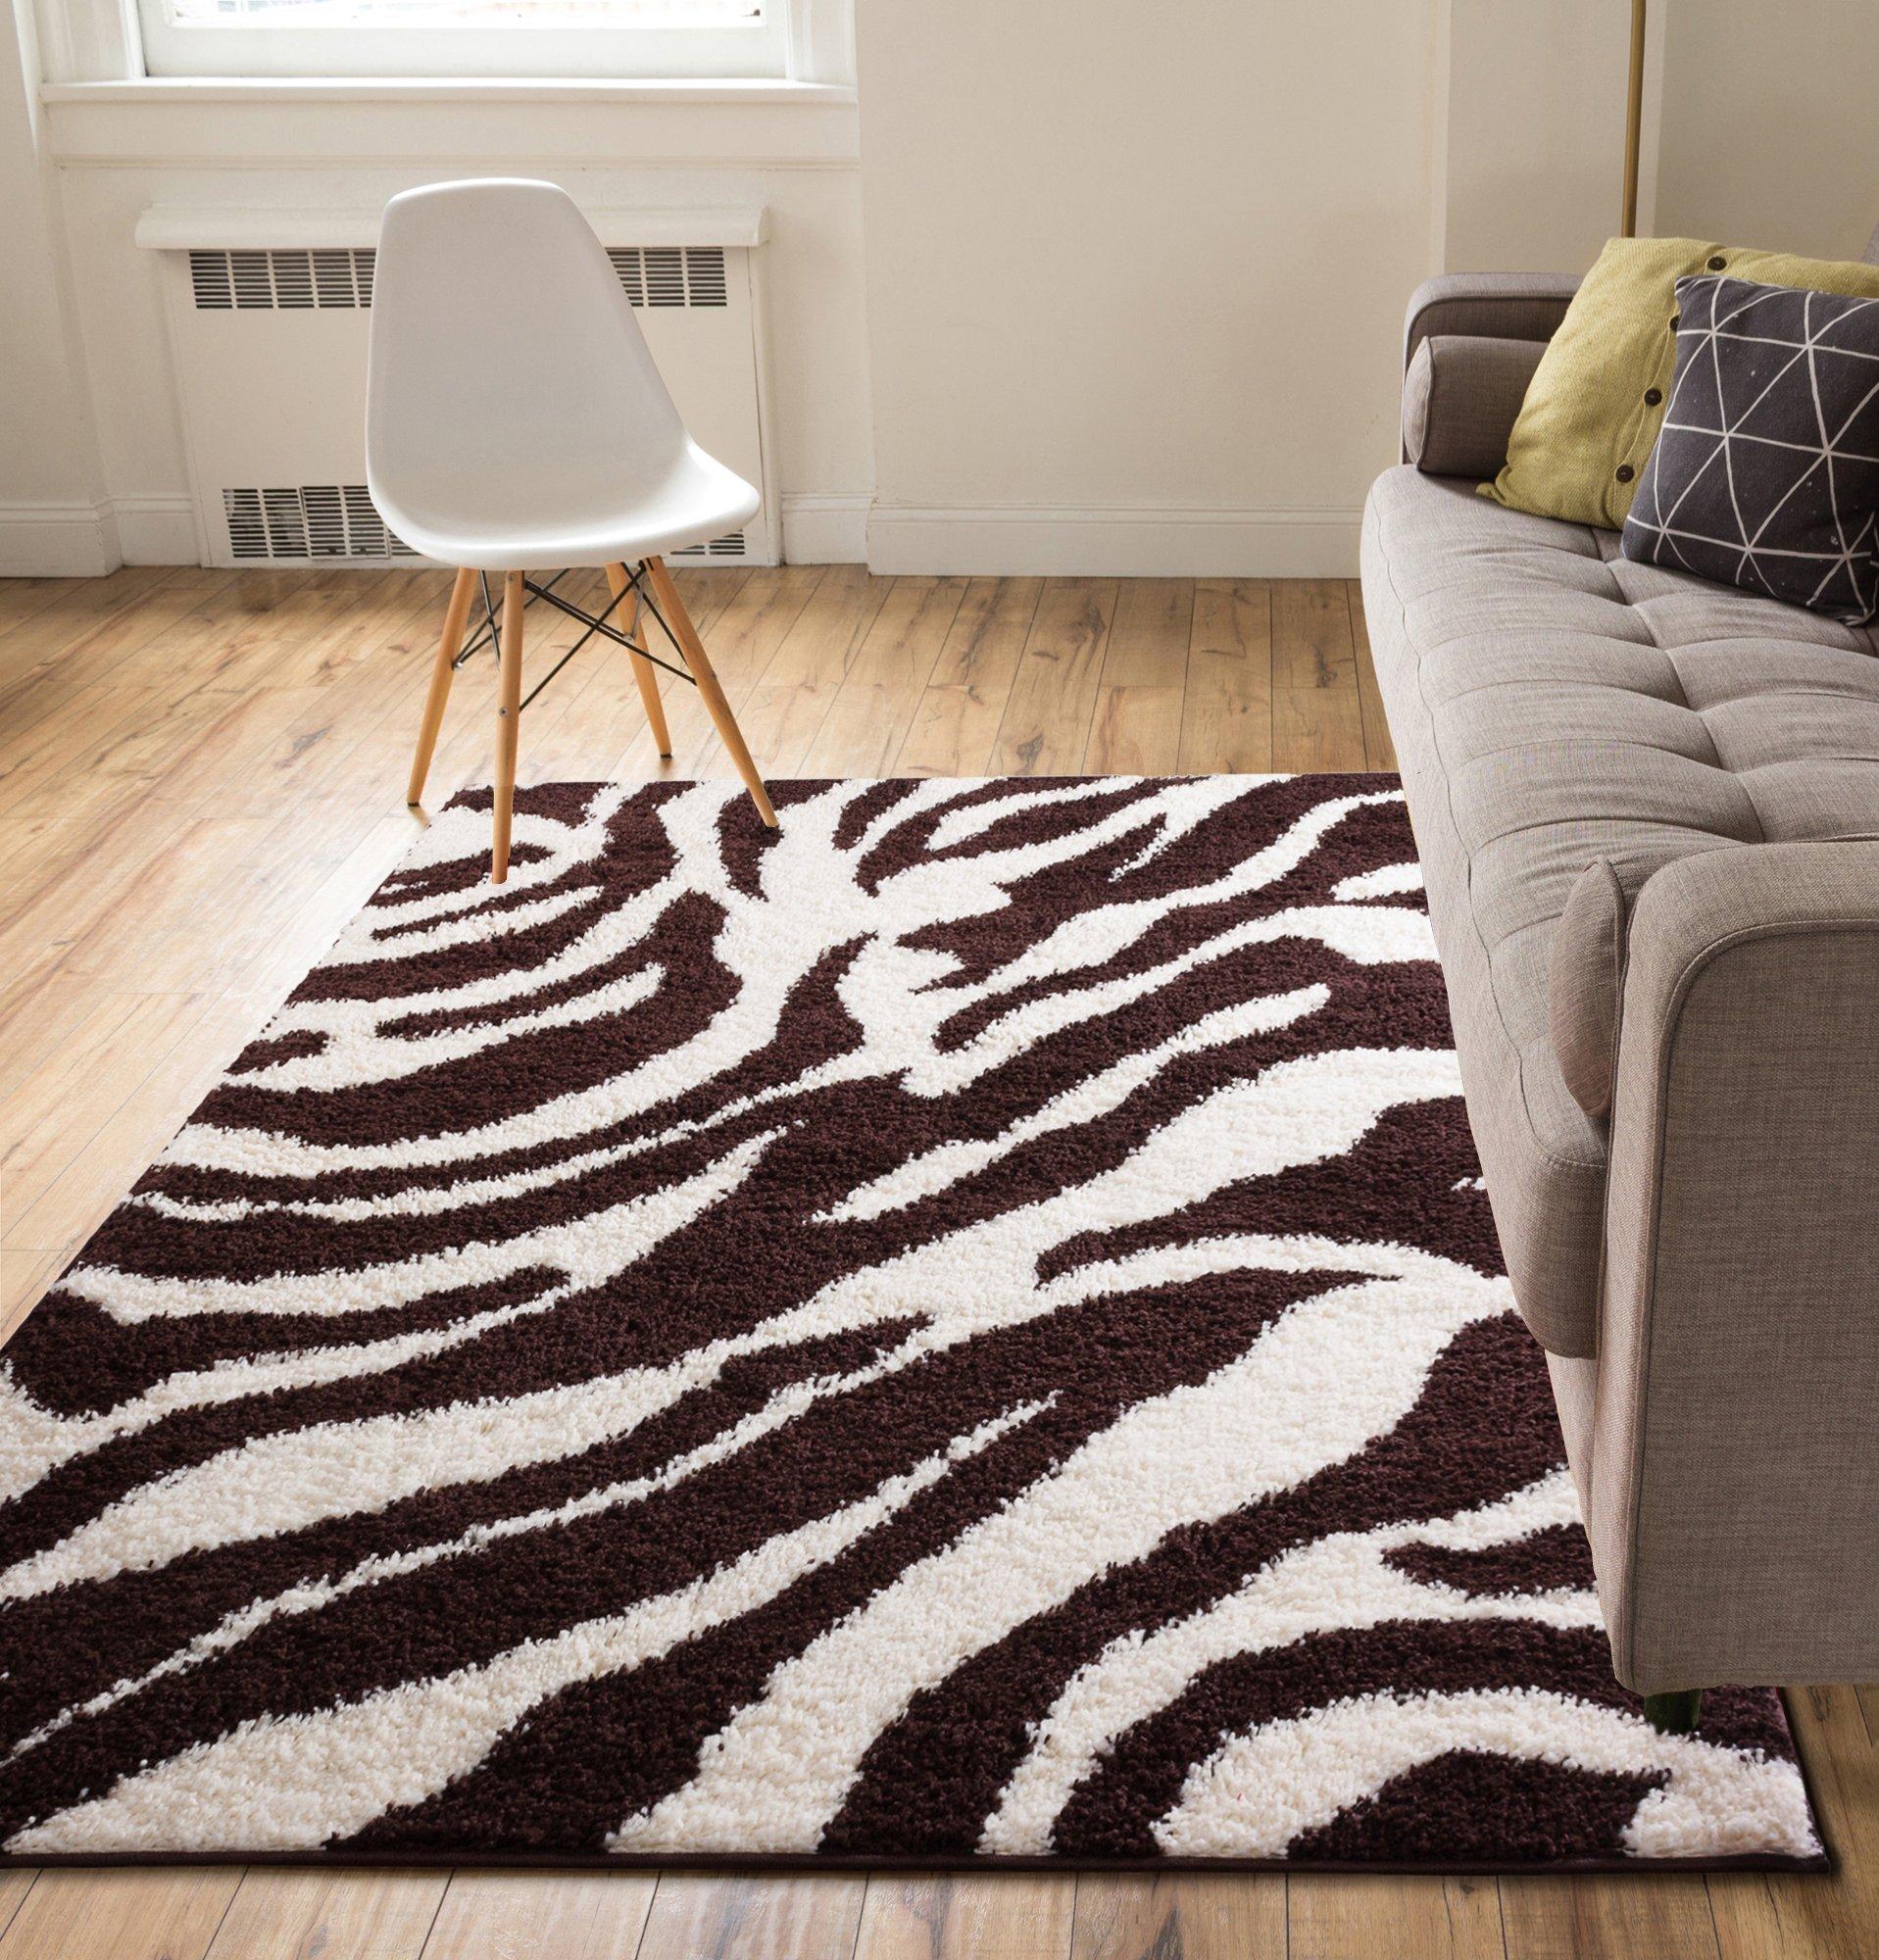 Modern Animal Print 5x7 ( 5' x 7'2'' ) Area Rug Shag Zebra Brown Ivory Plush Easy Care Thick Soft Plush Living Room